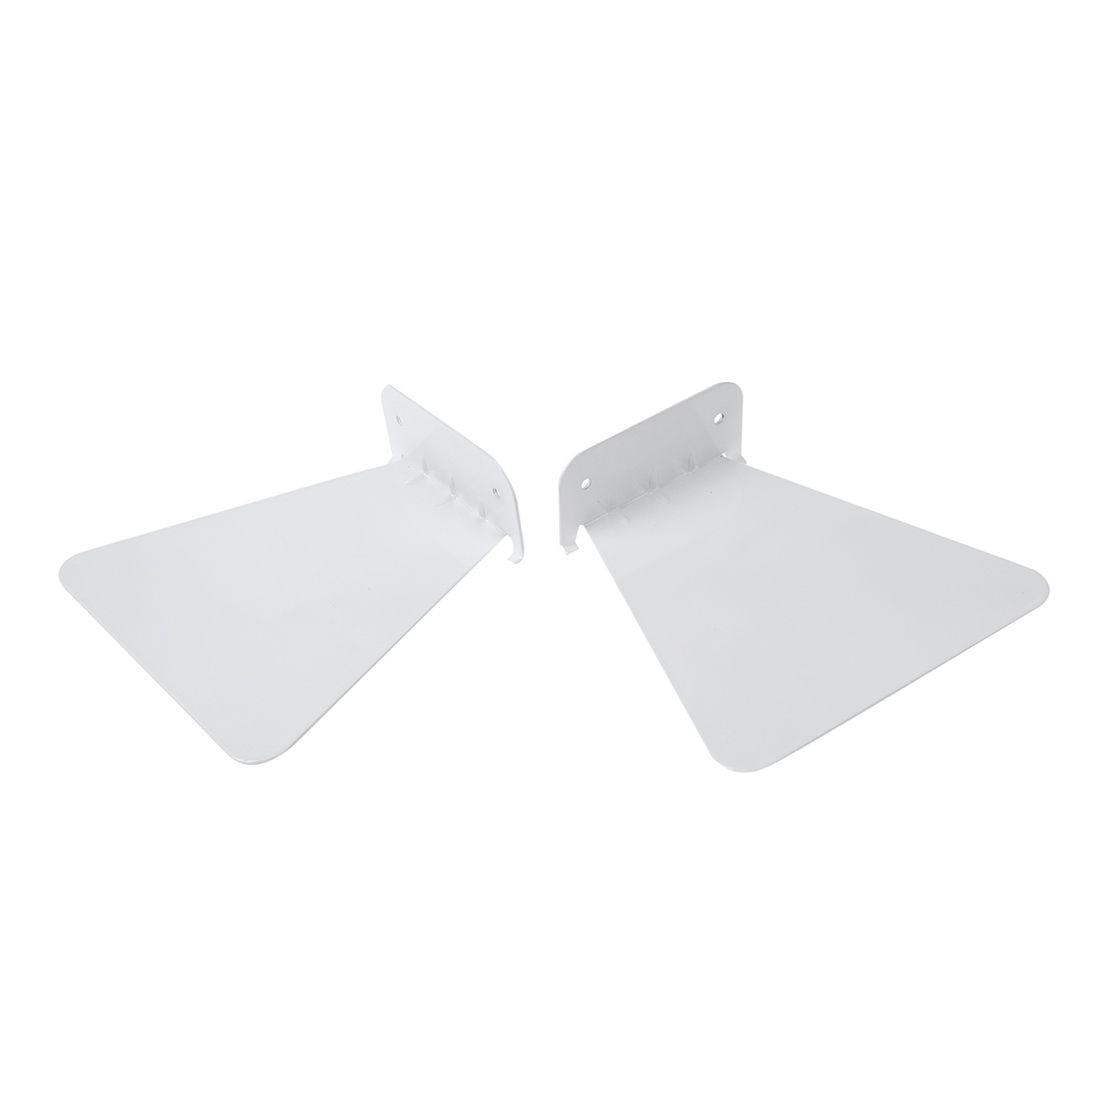 2pcs Modern Iron Book Shelf Wall Invisible Bookshelf For Home Decoration Floating Bookshelf(White)